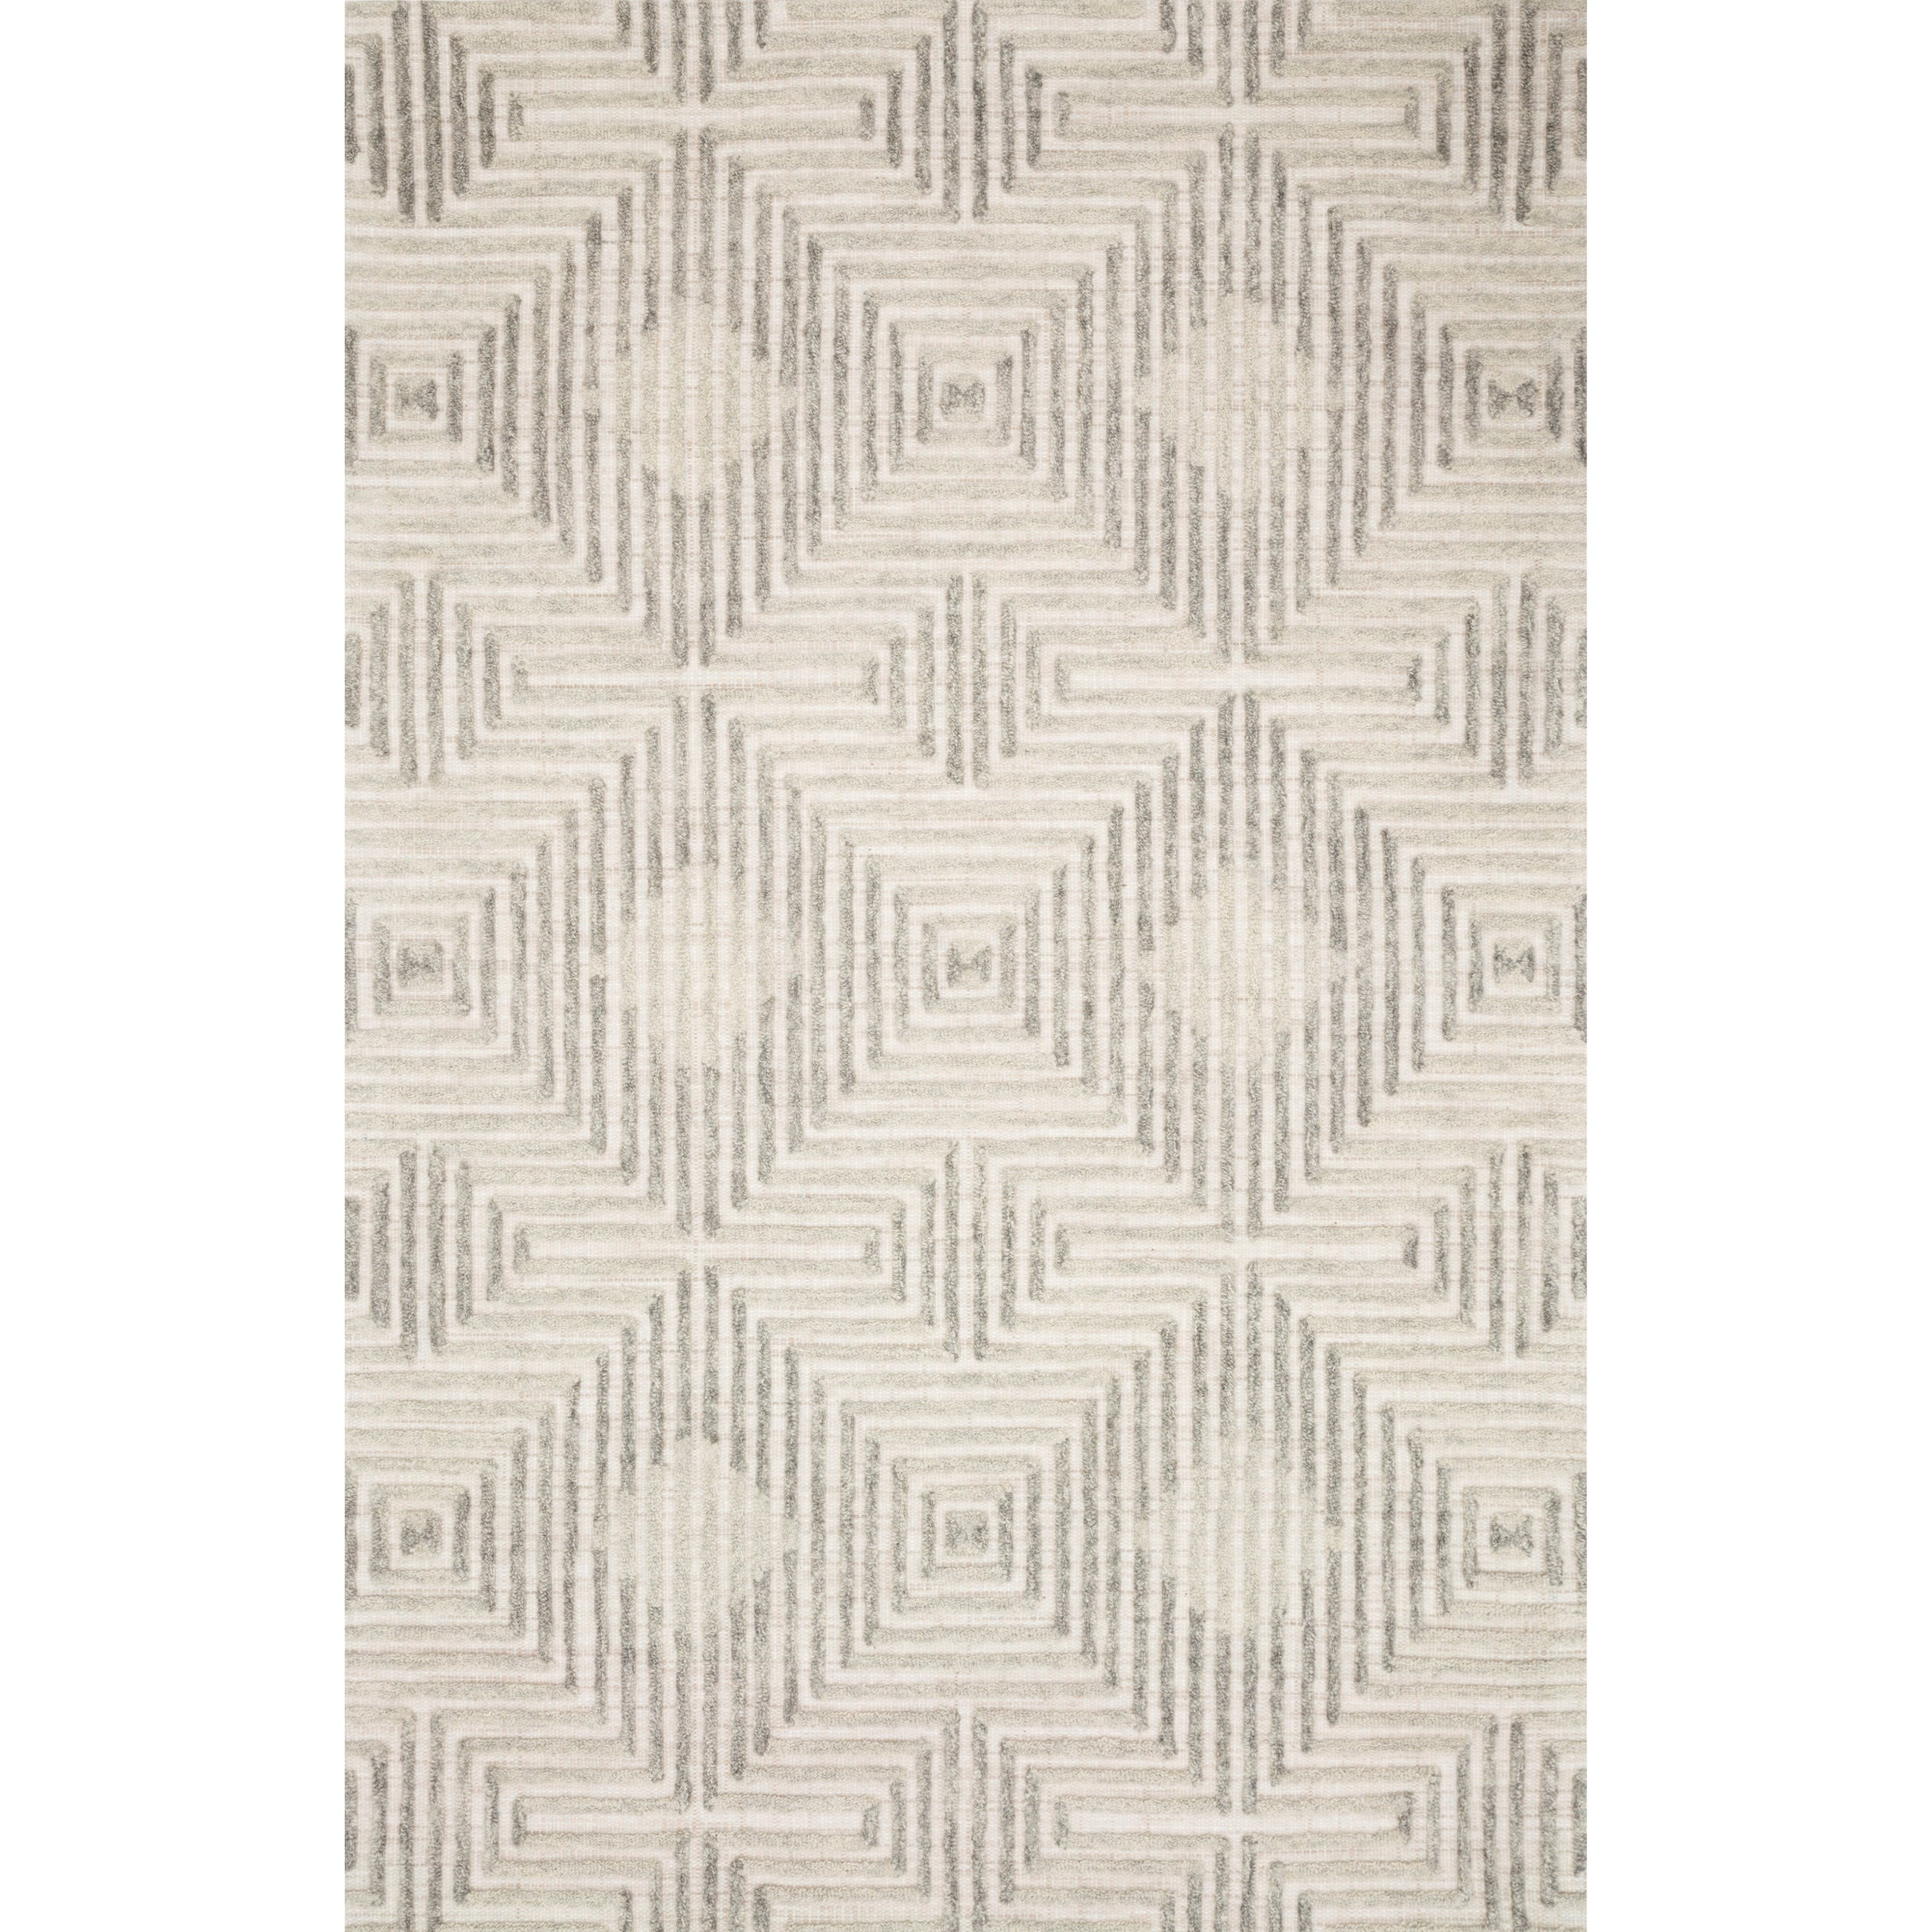 "Ehren 1'6"" x 1'6""  Grey / Silver Rug by Loloi Rugs at Virginia Furniture Market"